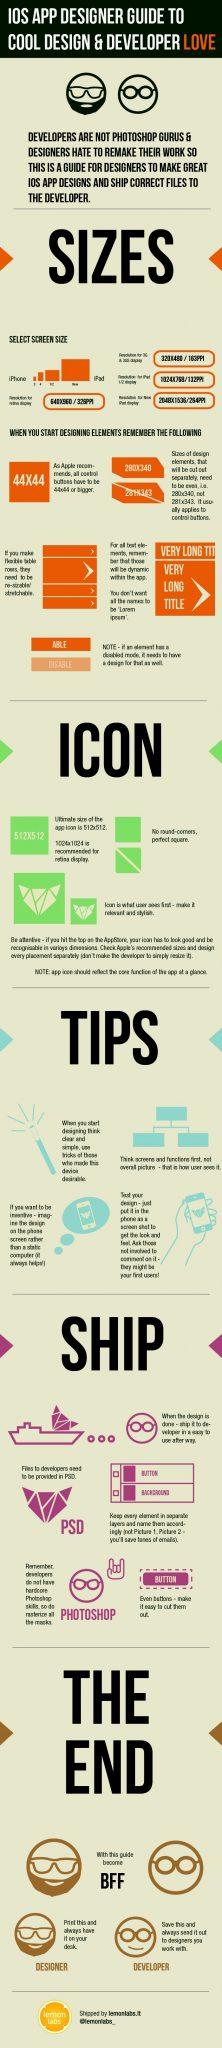 Infografia desarrolladores iOS